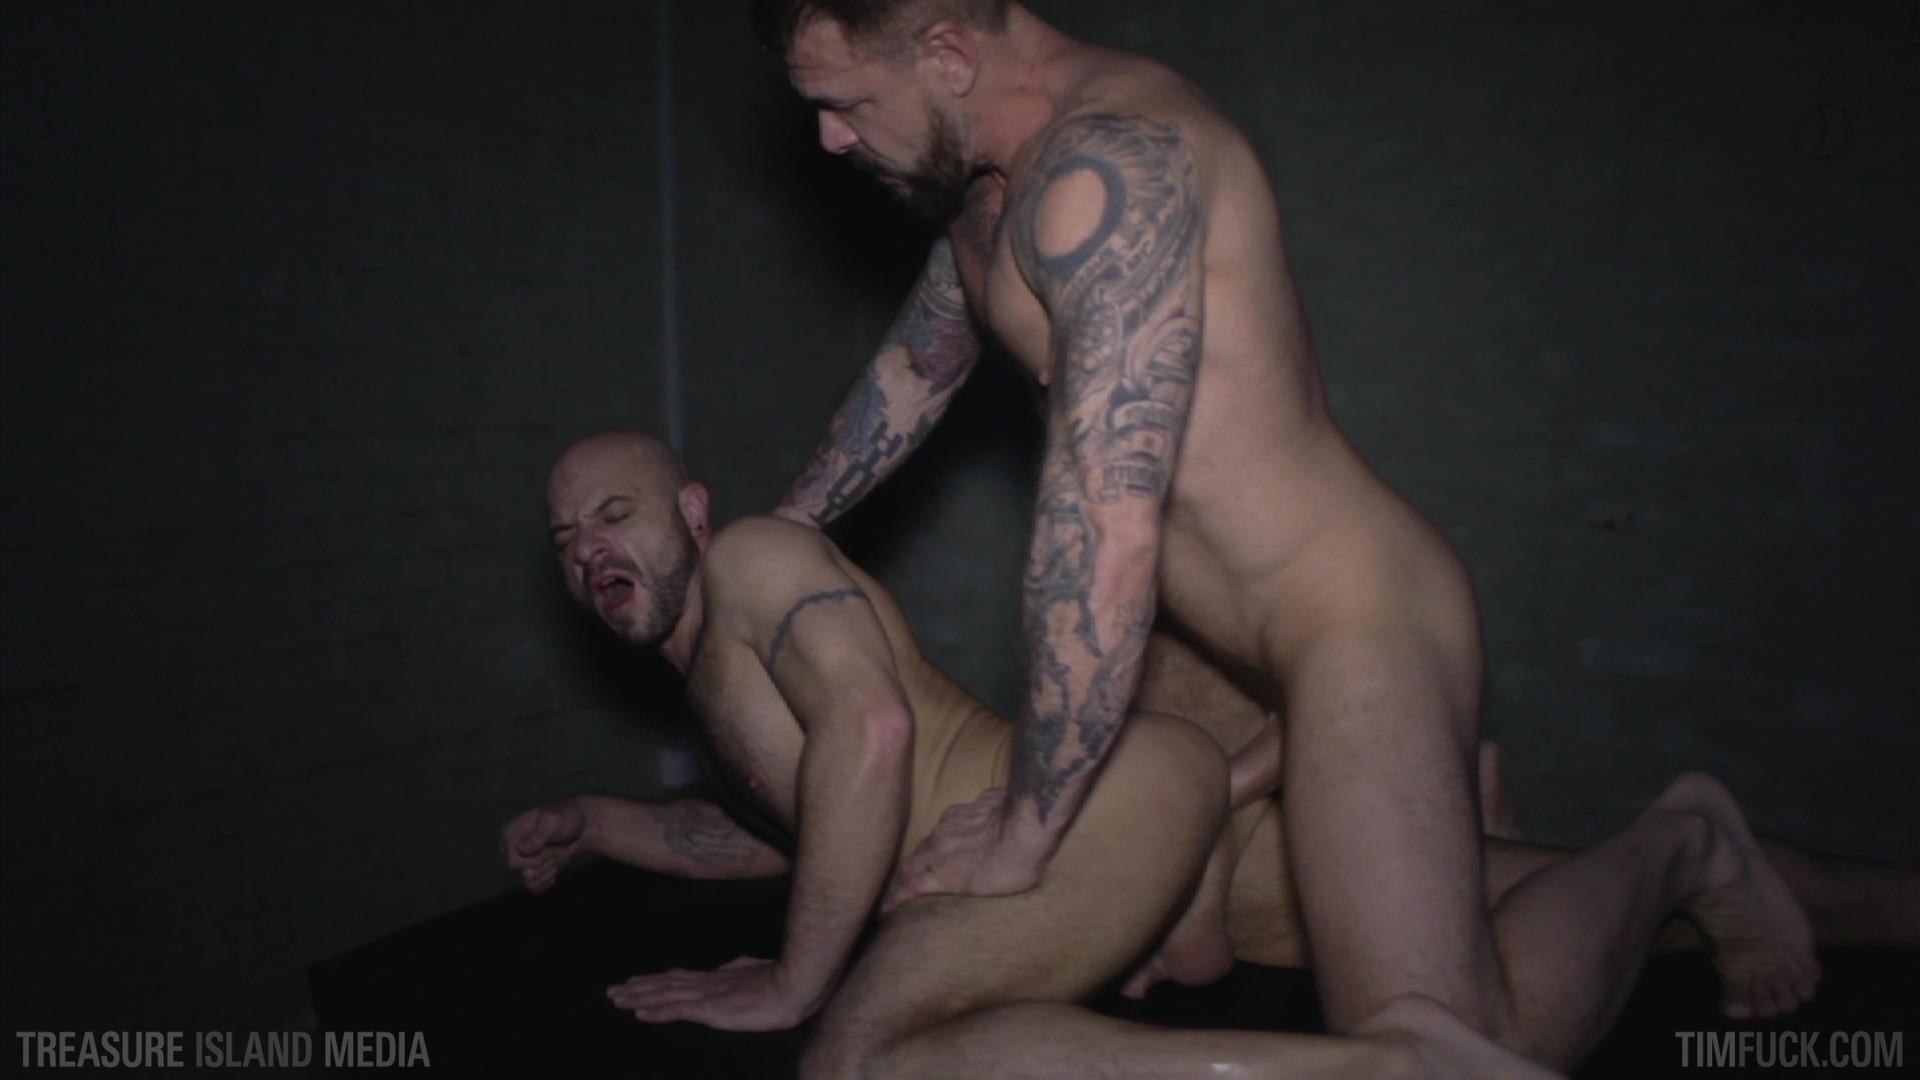 Treasure Island Media TimFuck Rocco Steele and Ben Statham Bareback Amateur Gay Porn 32 Treasure Island Media: Rocco Steele and Ben Statham Bareback In A London Bathhouse